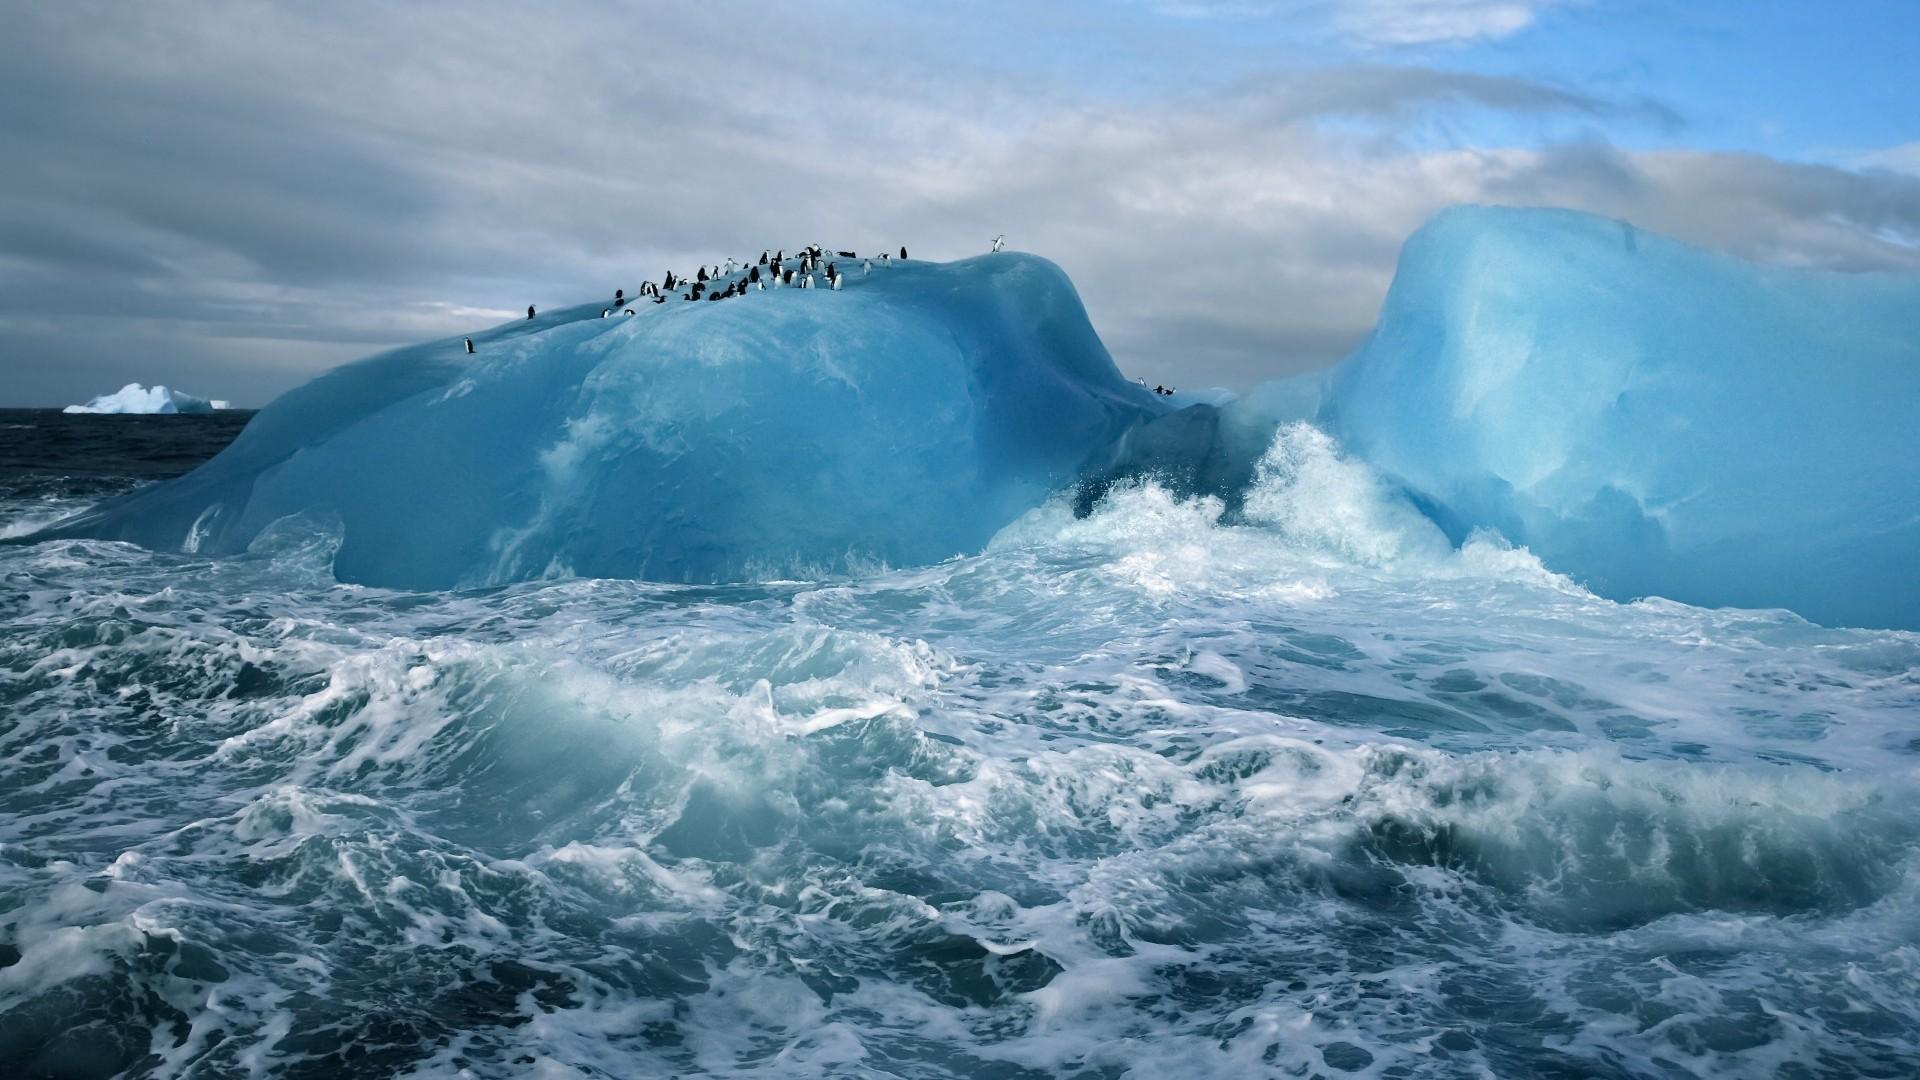 General 1920x1080 nature landscape winter iceberg sea clouds Arctic penguins animals waves